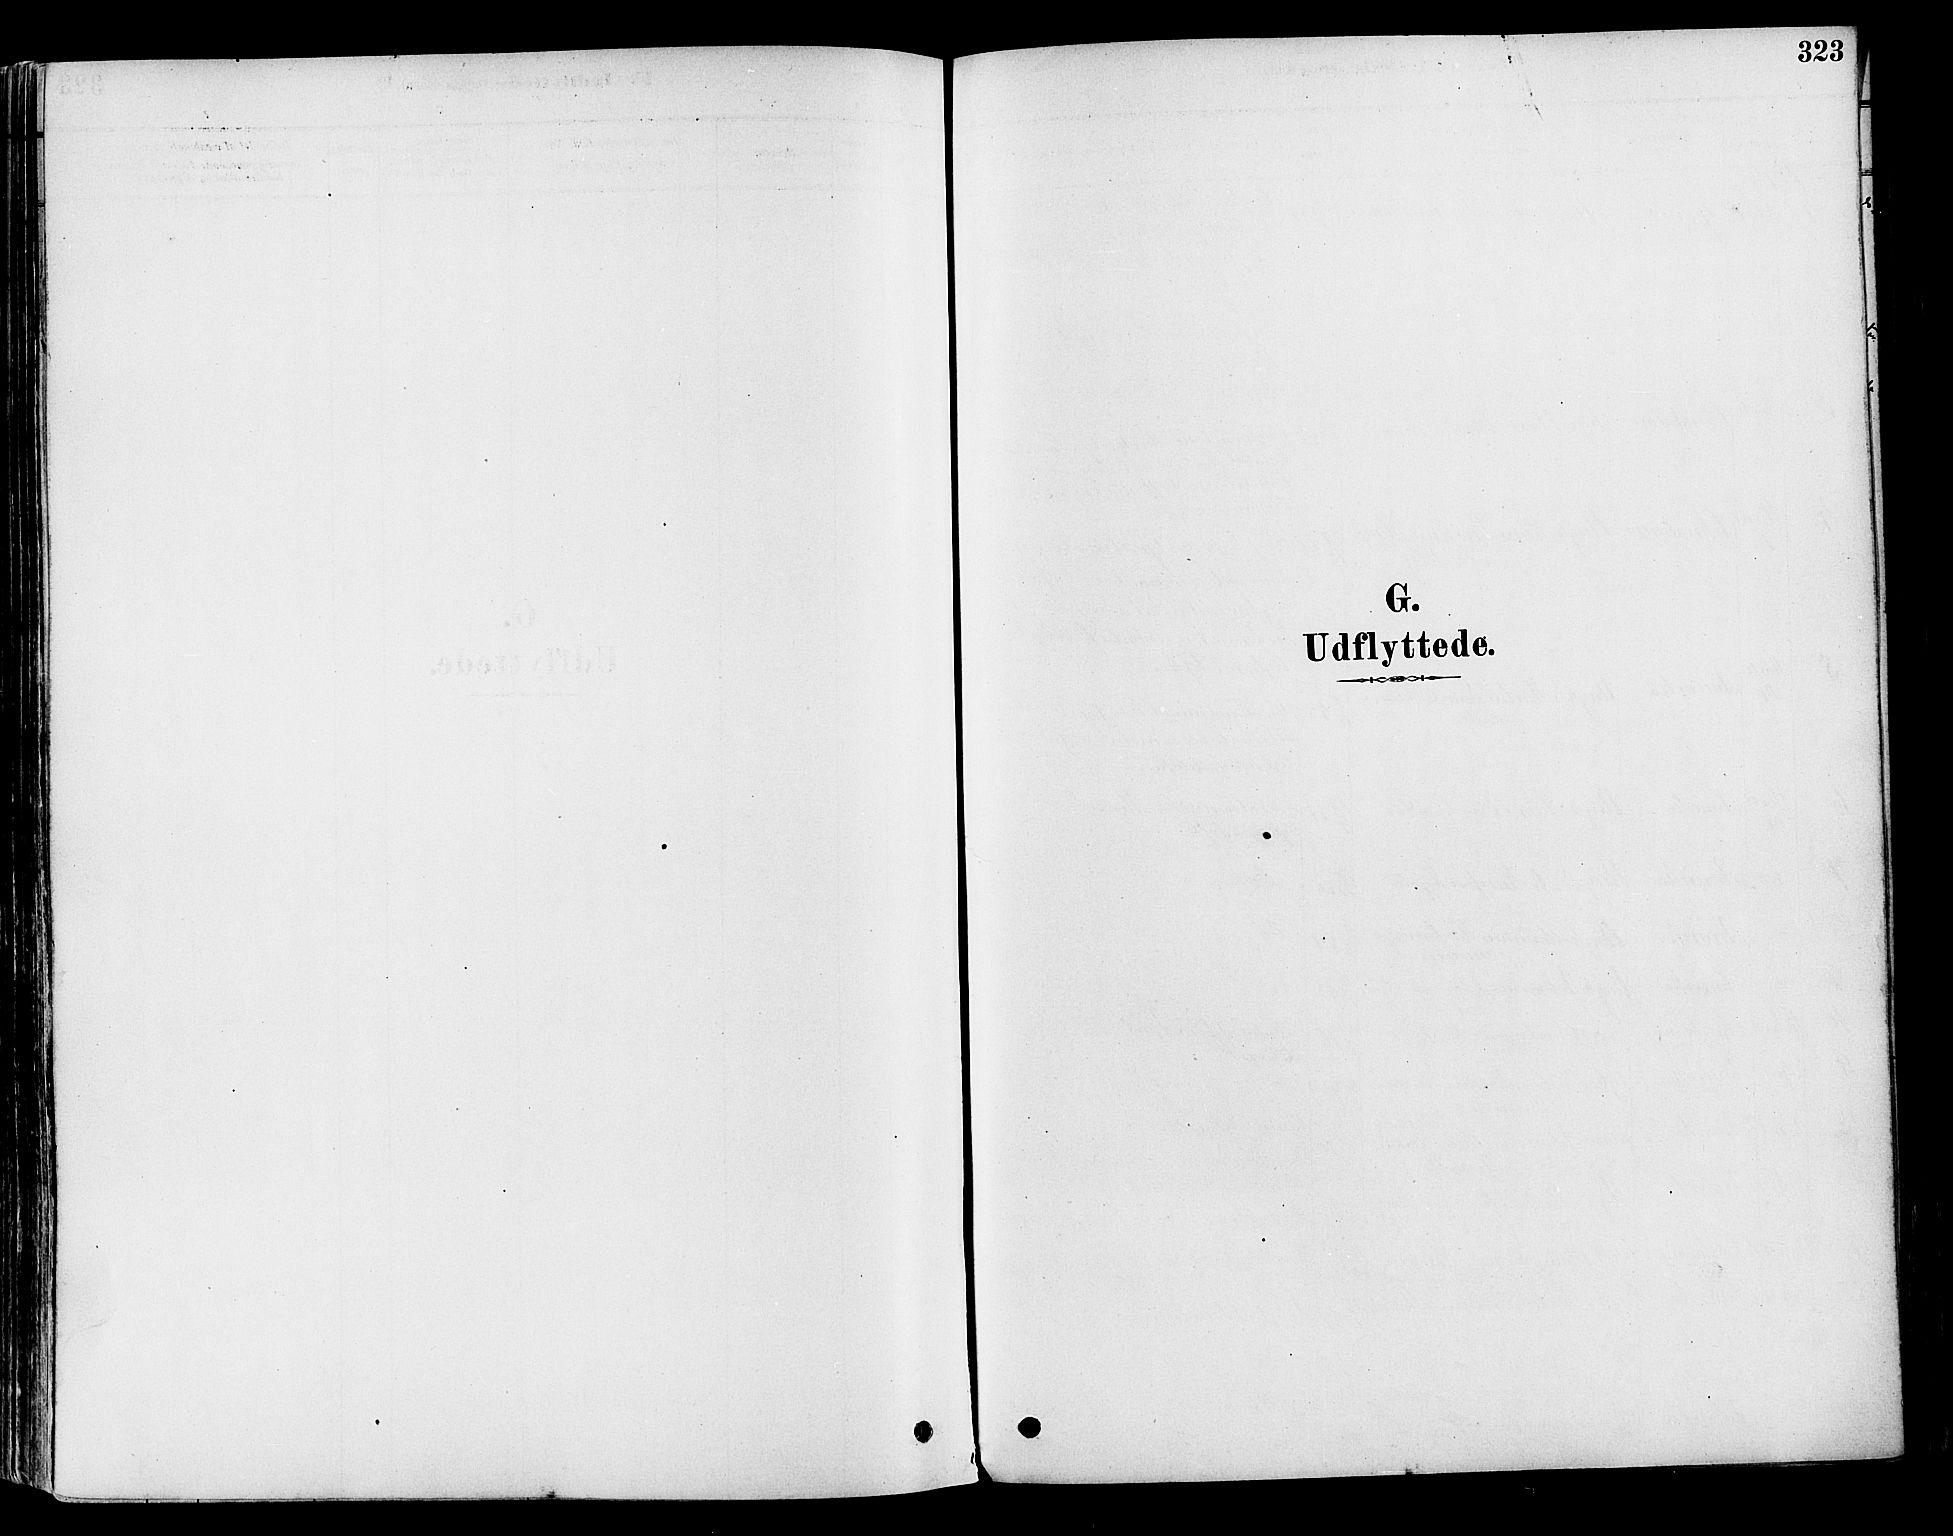 SAH, Vestre Toten prestekontor, H/Ha/Haa/L0009: Ministerialbok nr. 9, 1878-1894, s. 323